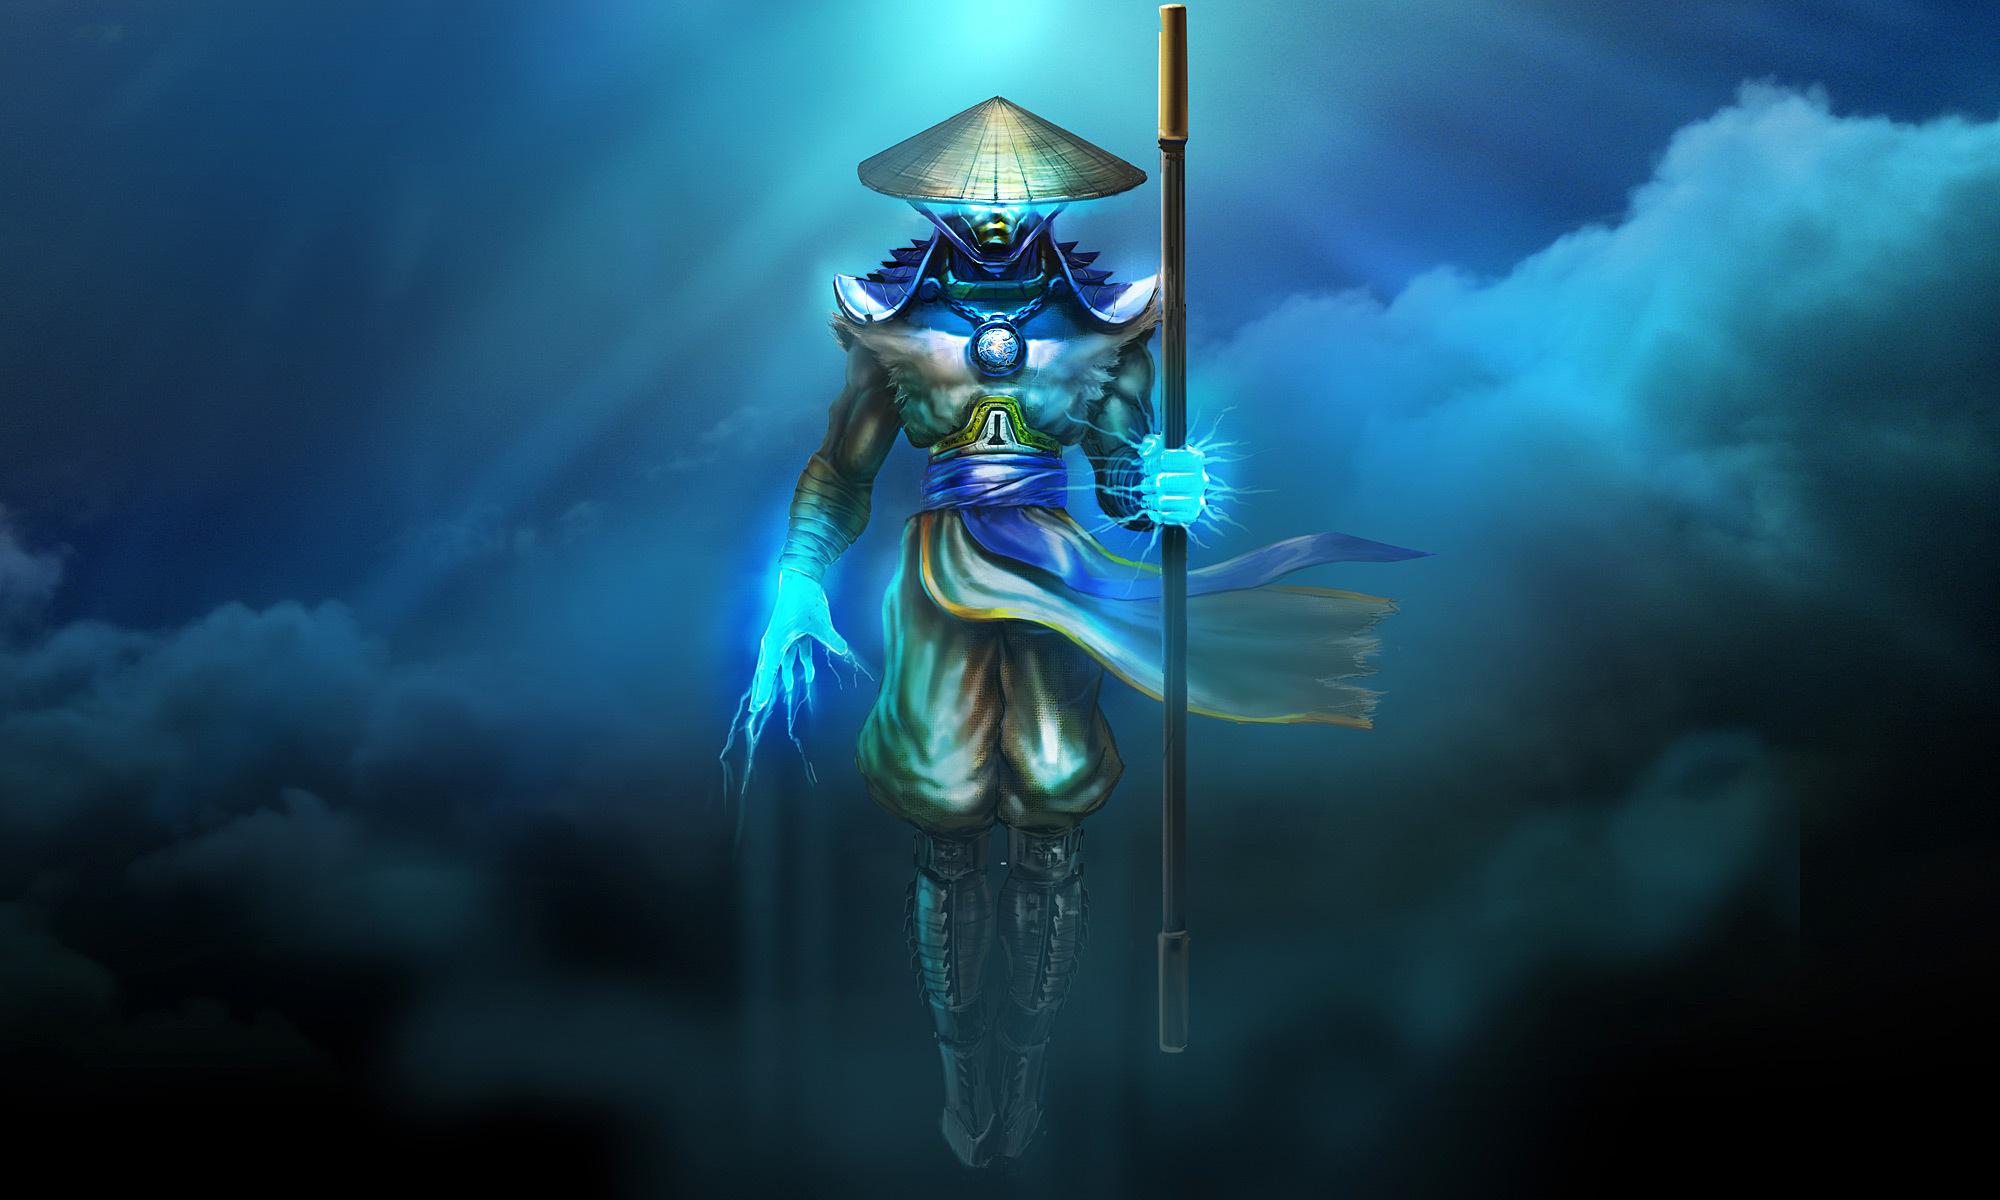 Mortal Kombat Warriors Raiden Games warrior fantasy magic wallpaper 2000x1200